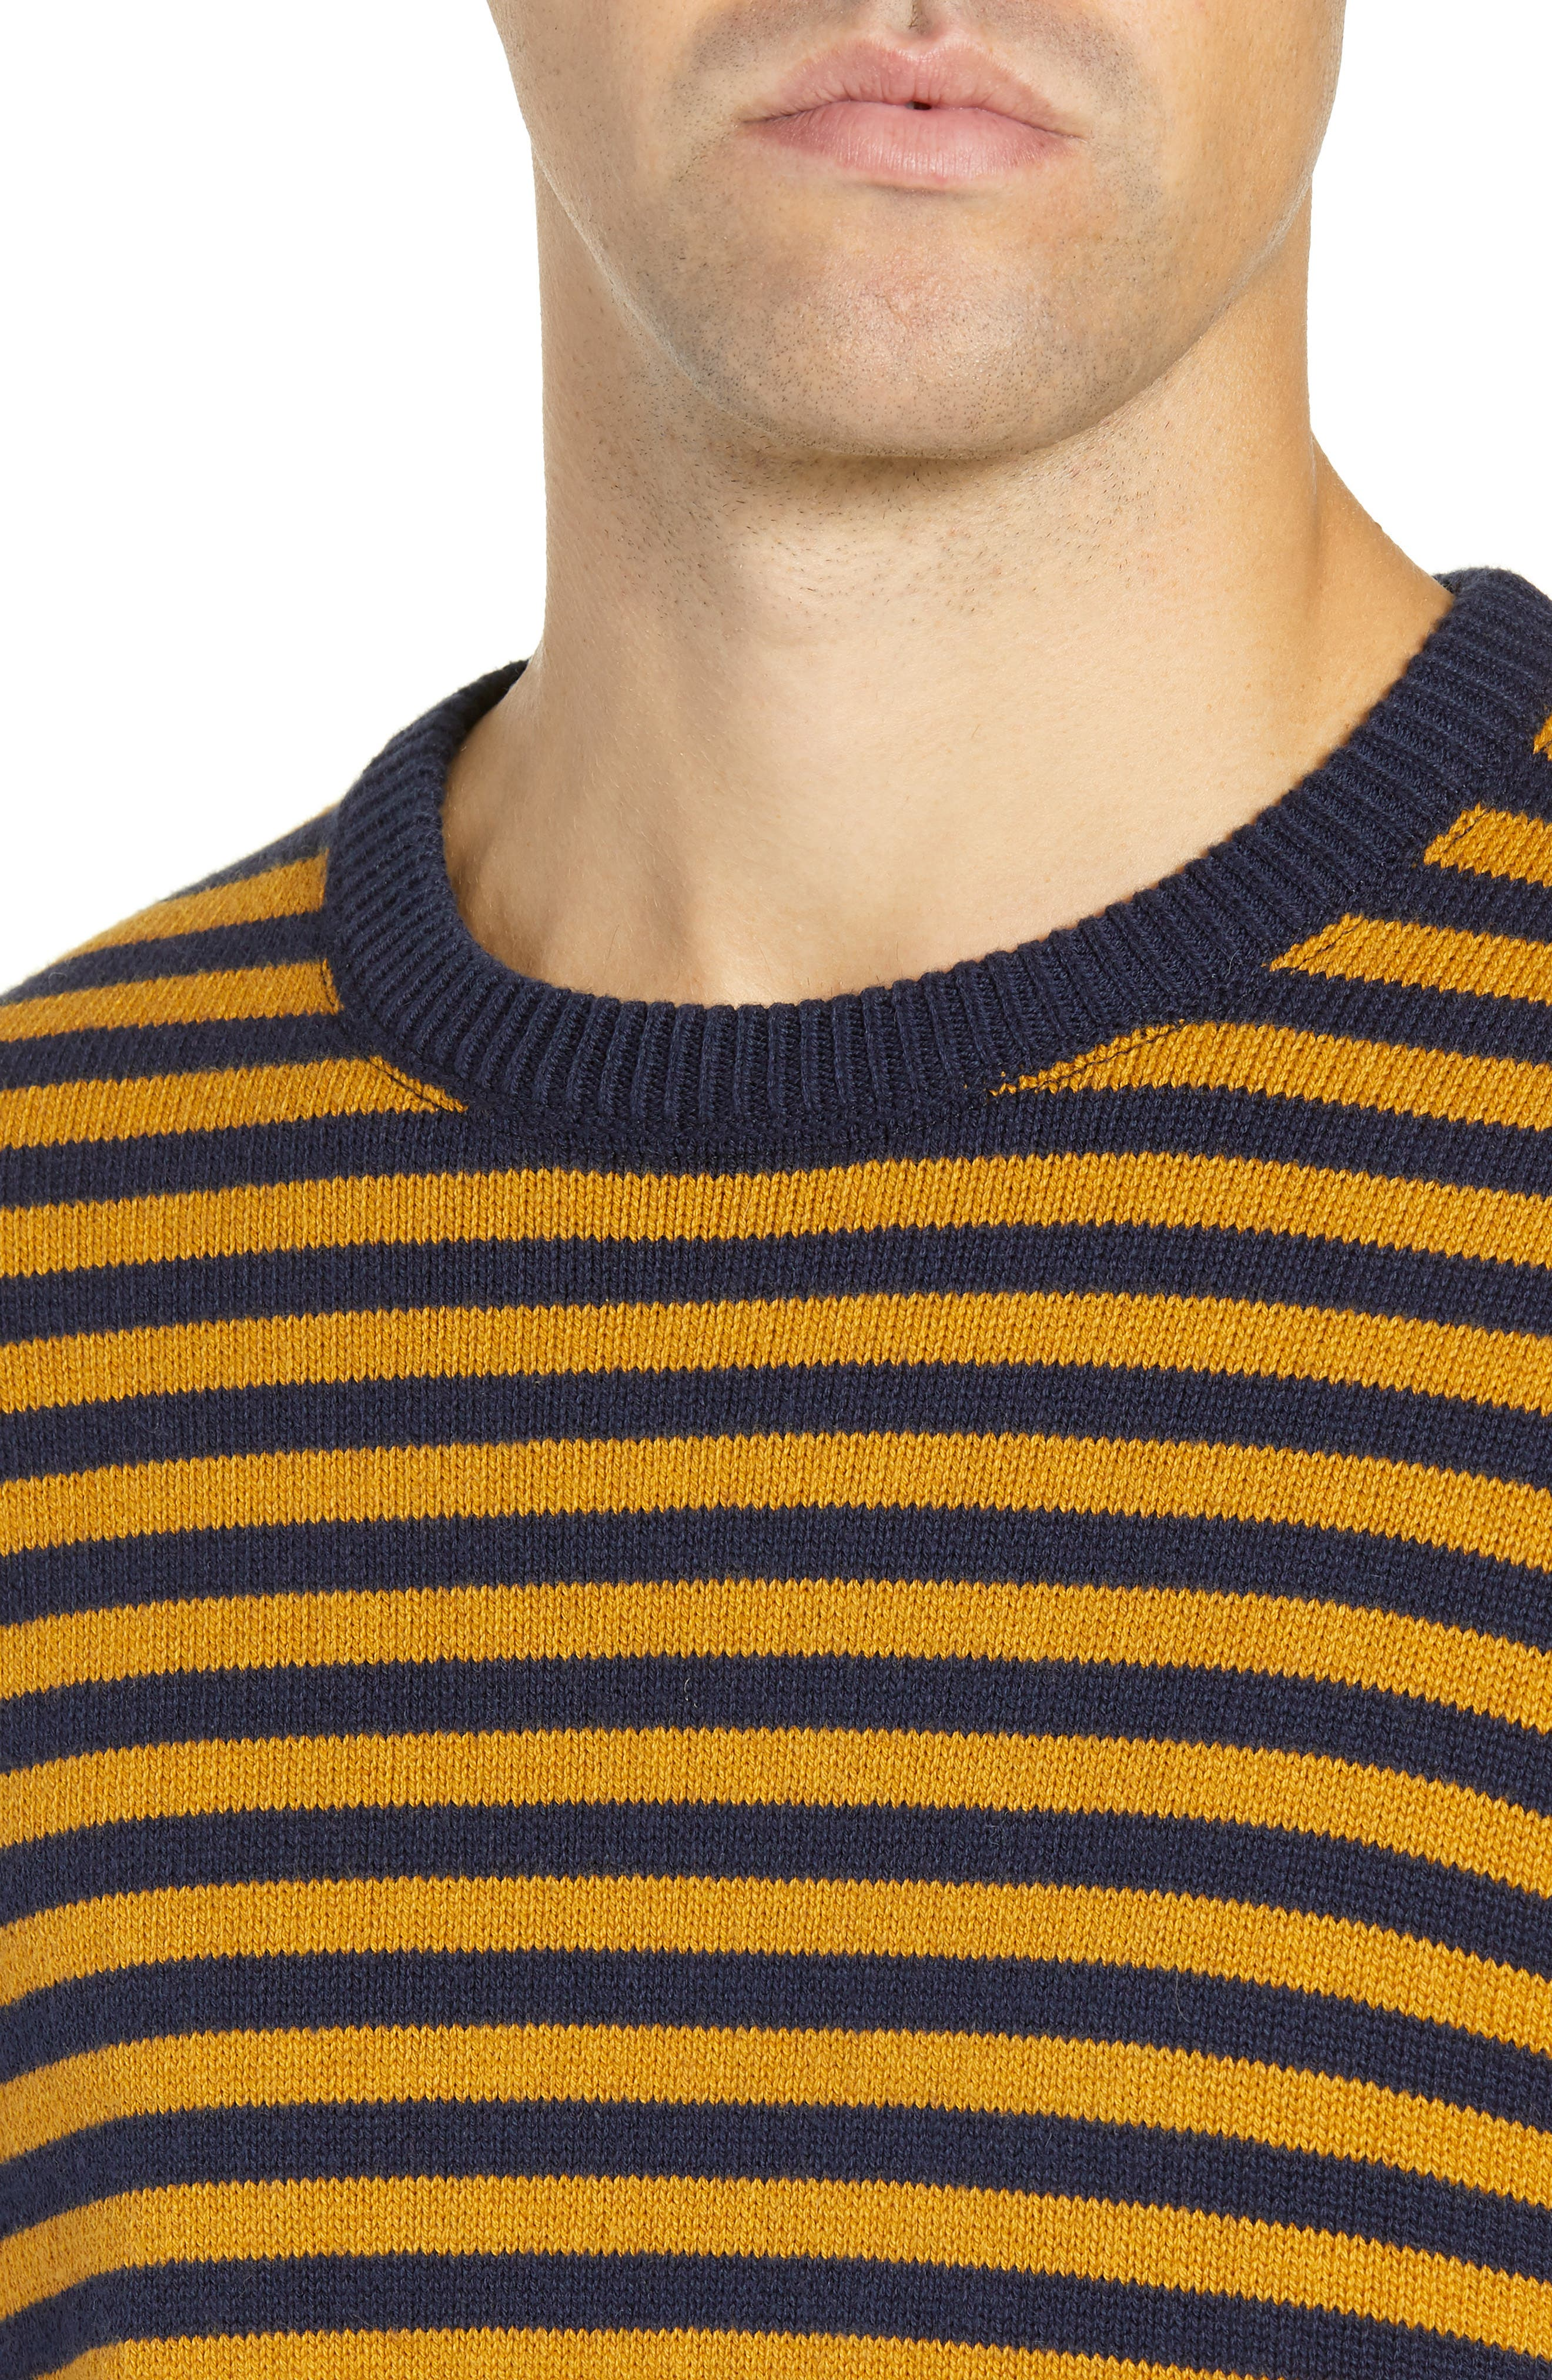 Stripe Cotton & Wool Sweater,                             Alternate thumbnail 4, color,                             CALLUNA YELLOW UTILITY BLUE